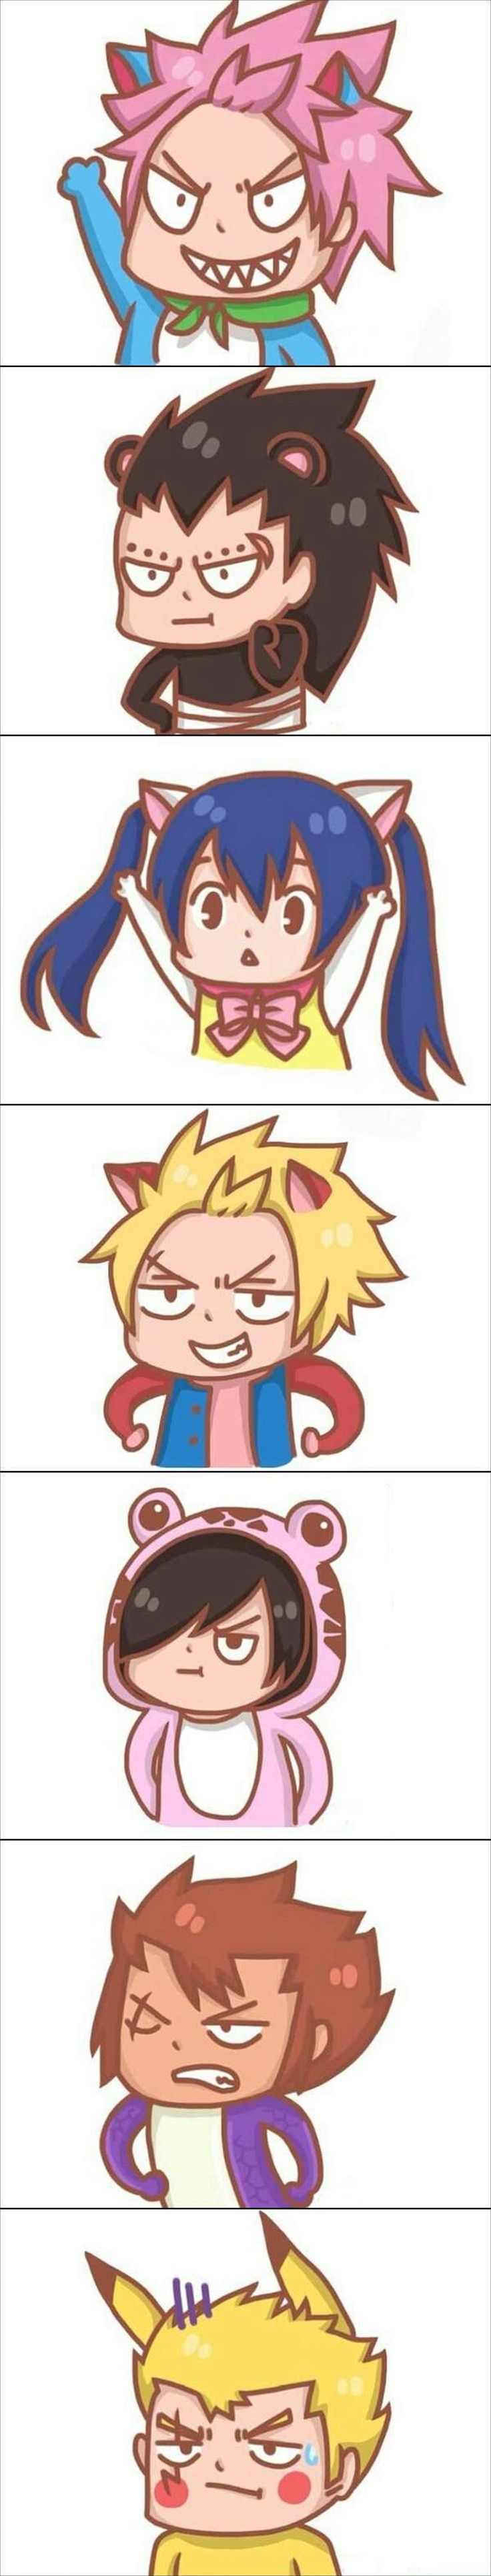 Fairy Tail - Natsu, Gajeel, Sting, Rogue, Cobra, Laxus and Wendy the last one! Ahahahahahhahaaaaa